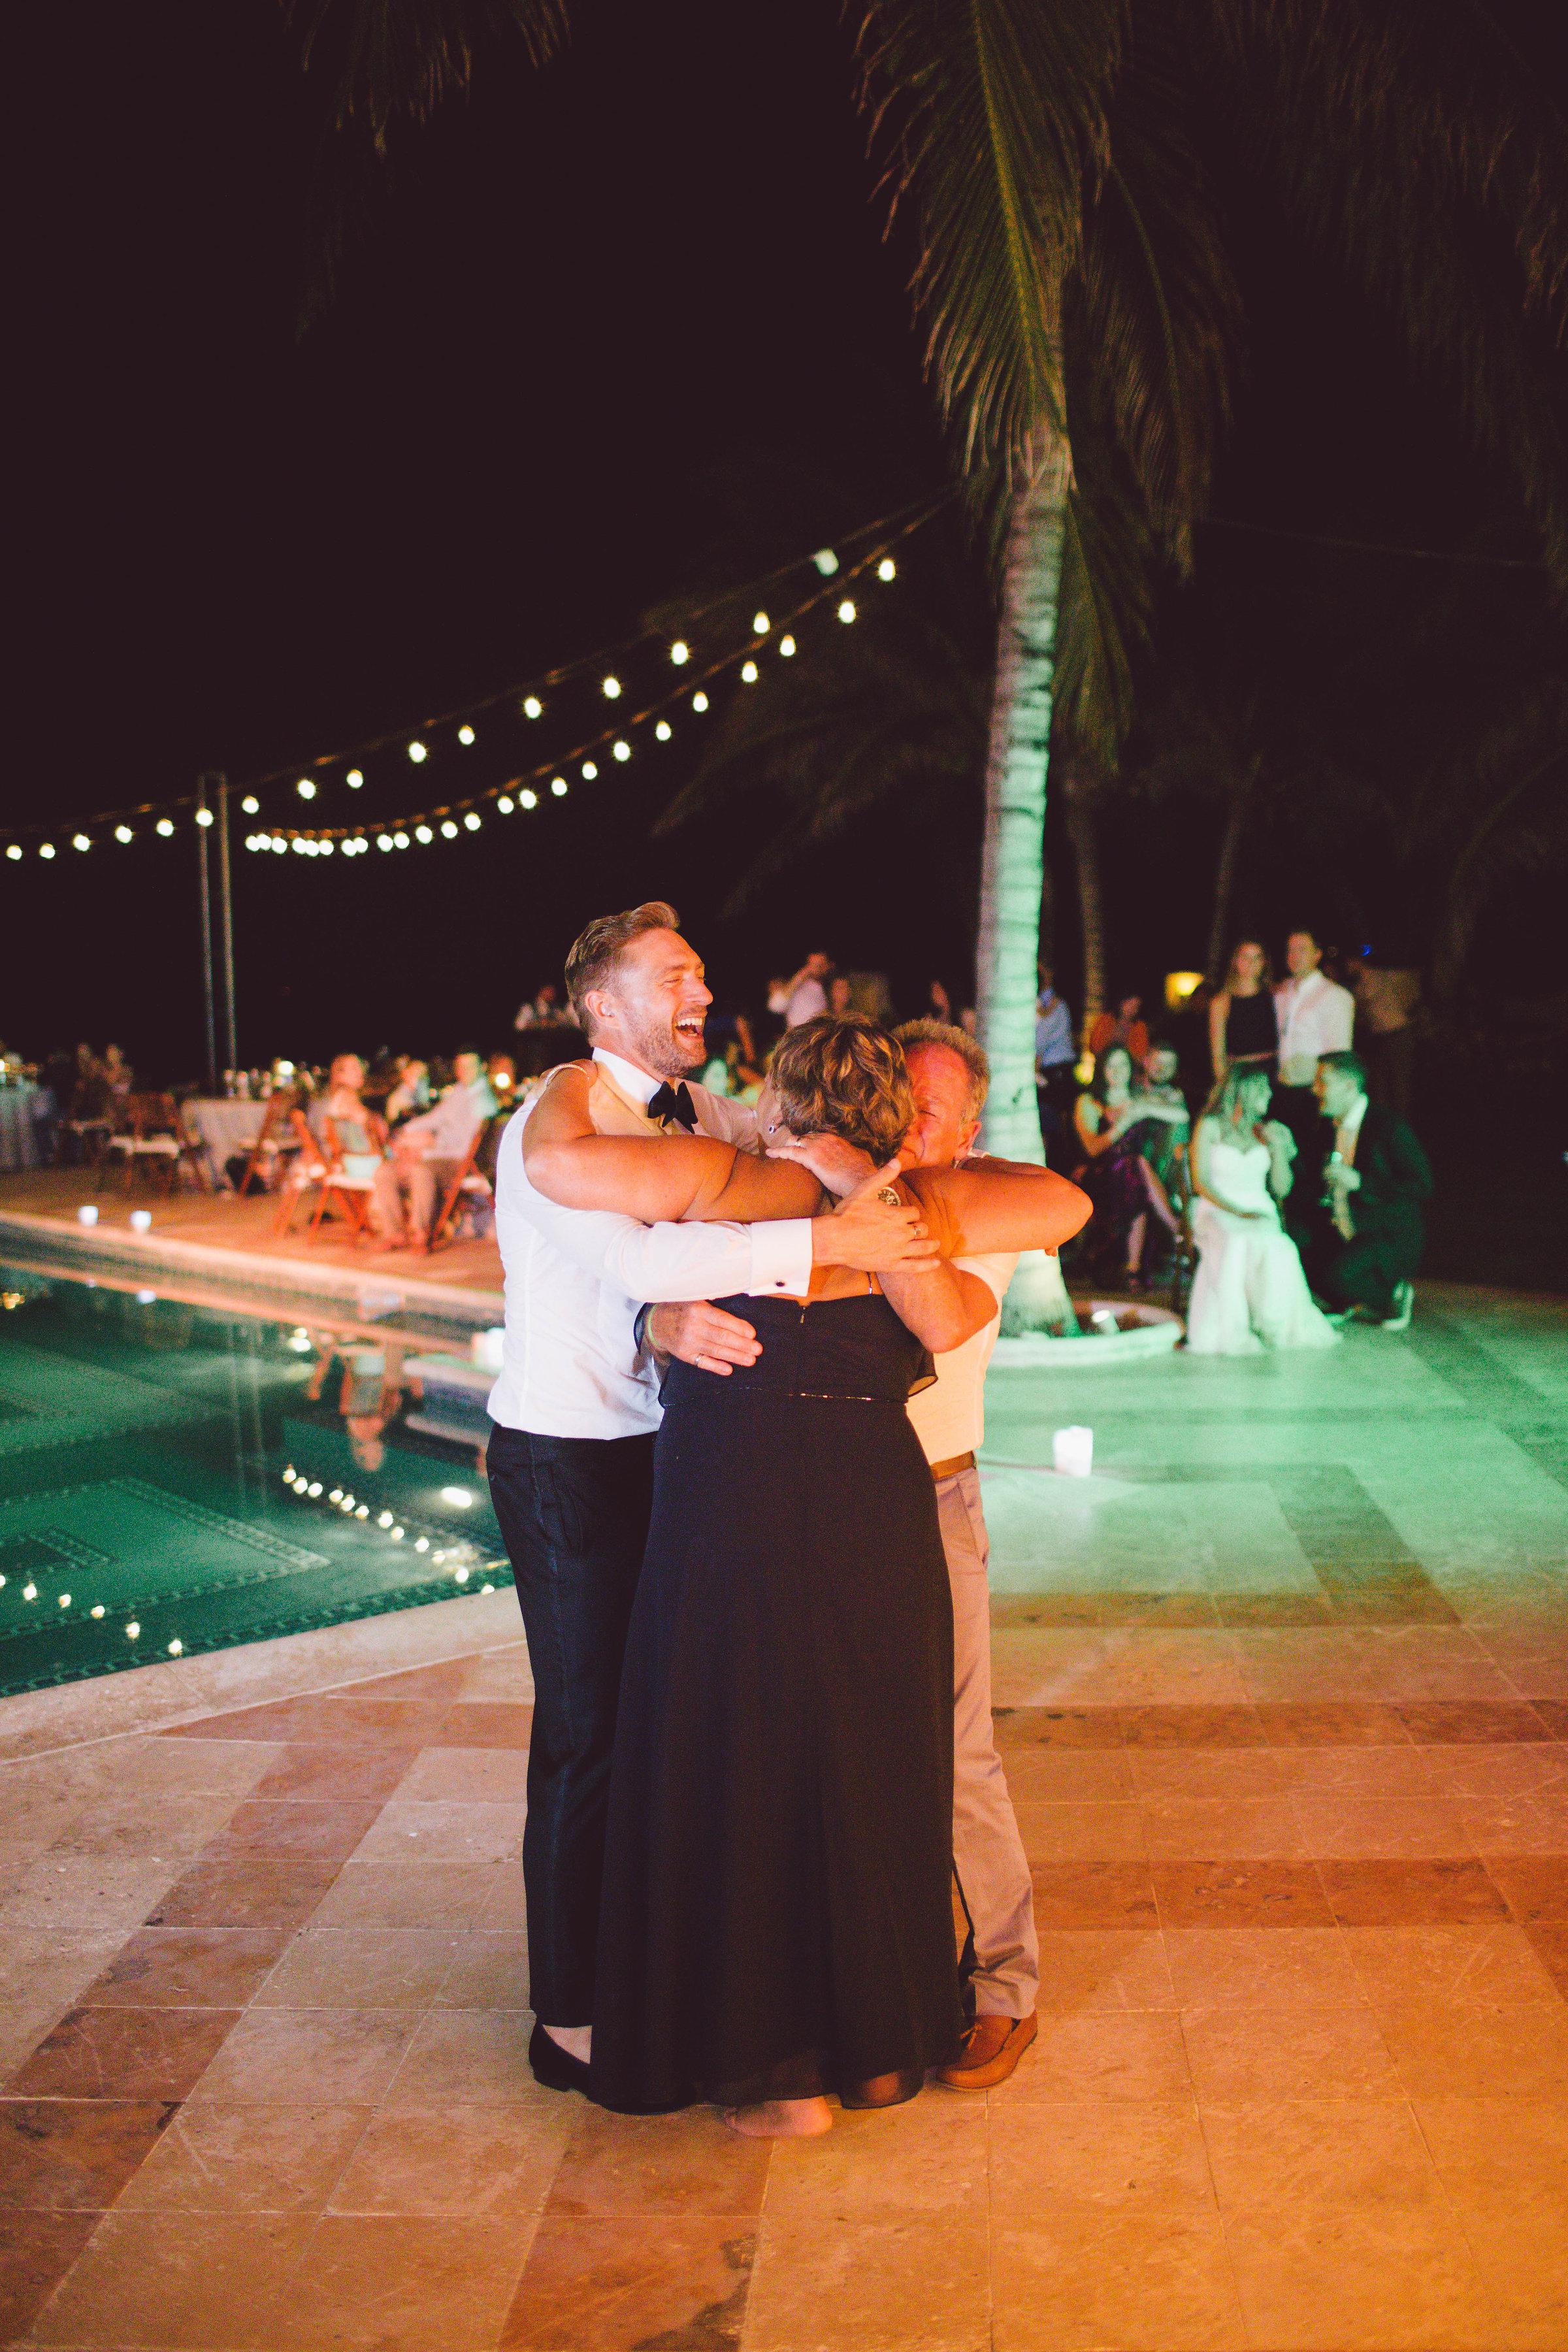 mexico_wedding_cancun_villa_la_joya_evangeline_lane_144.jpg